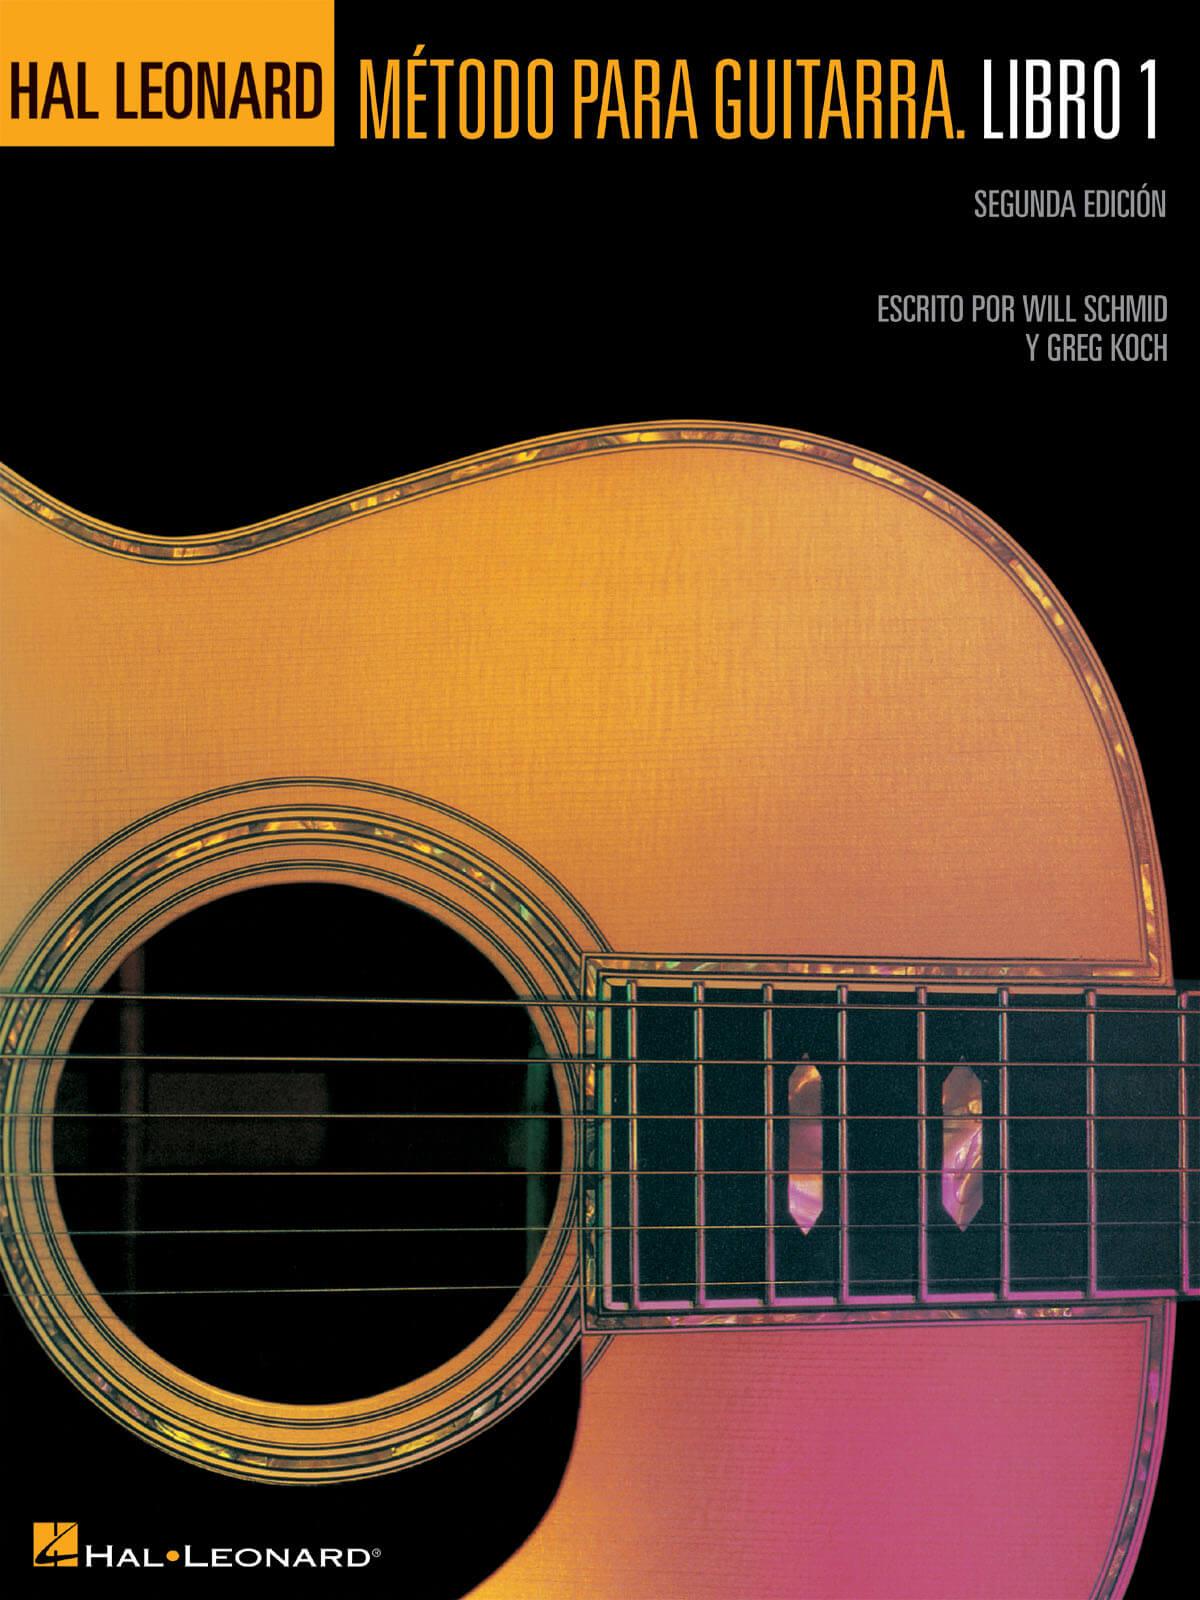 Motodo Para Guitarra Hal Leonard Libro 1